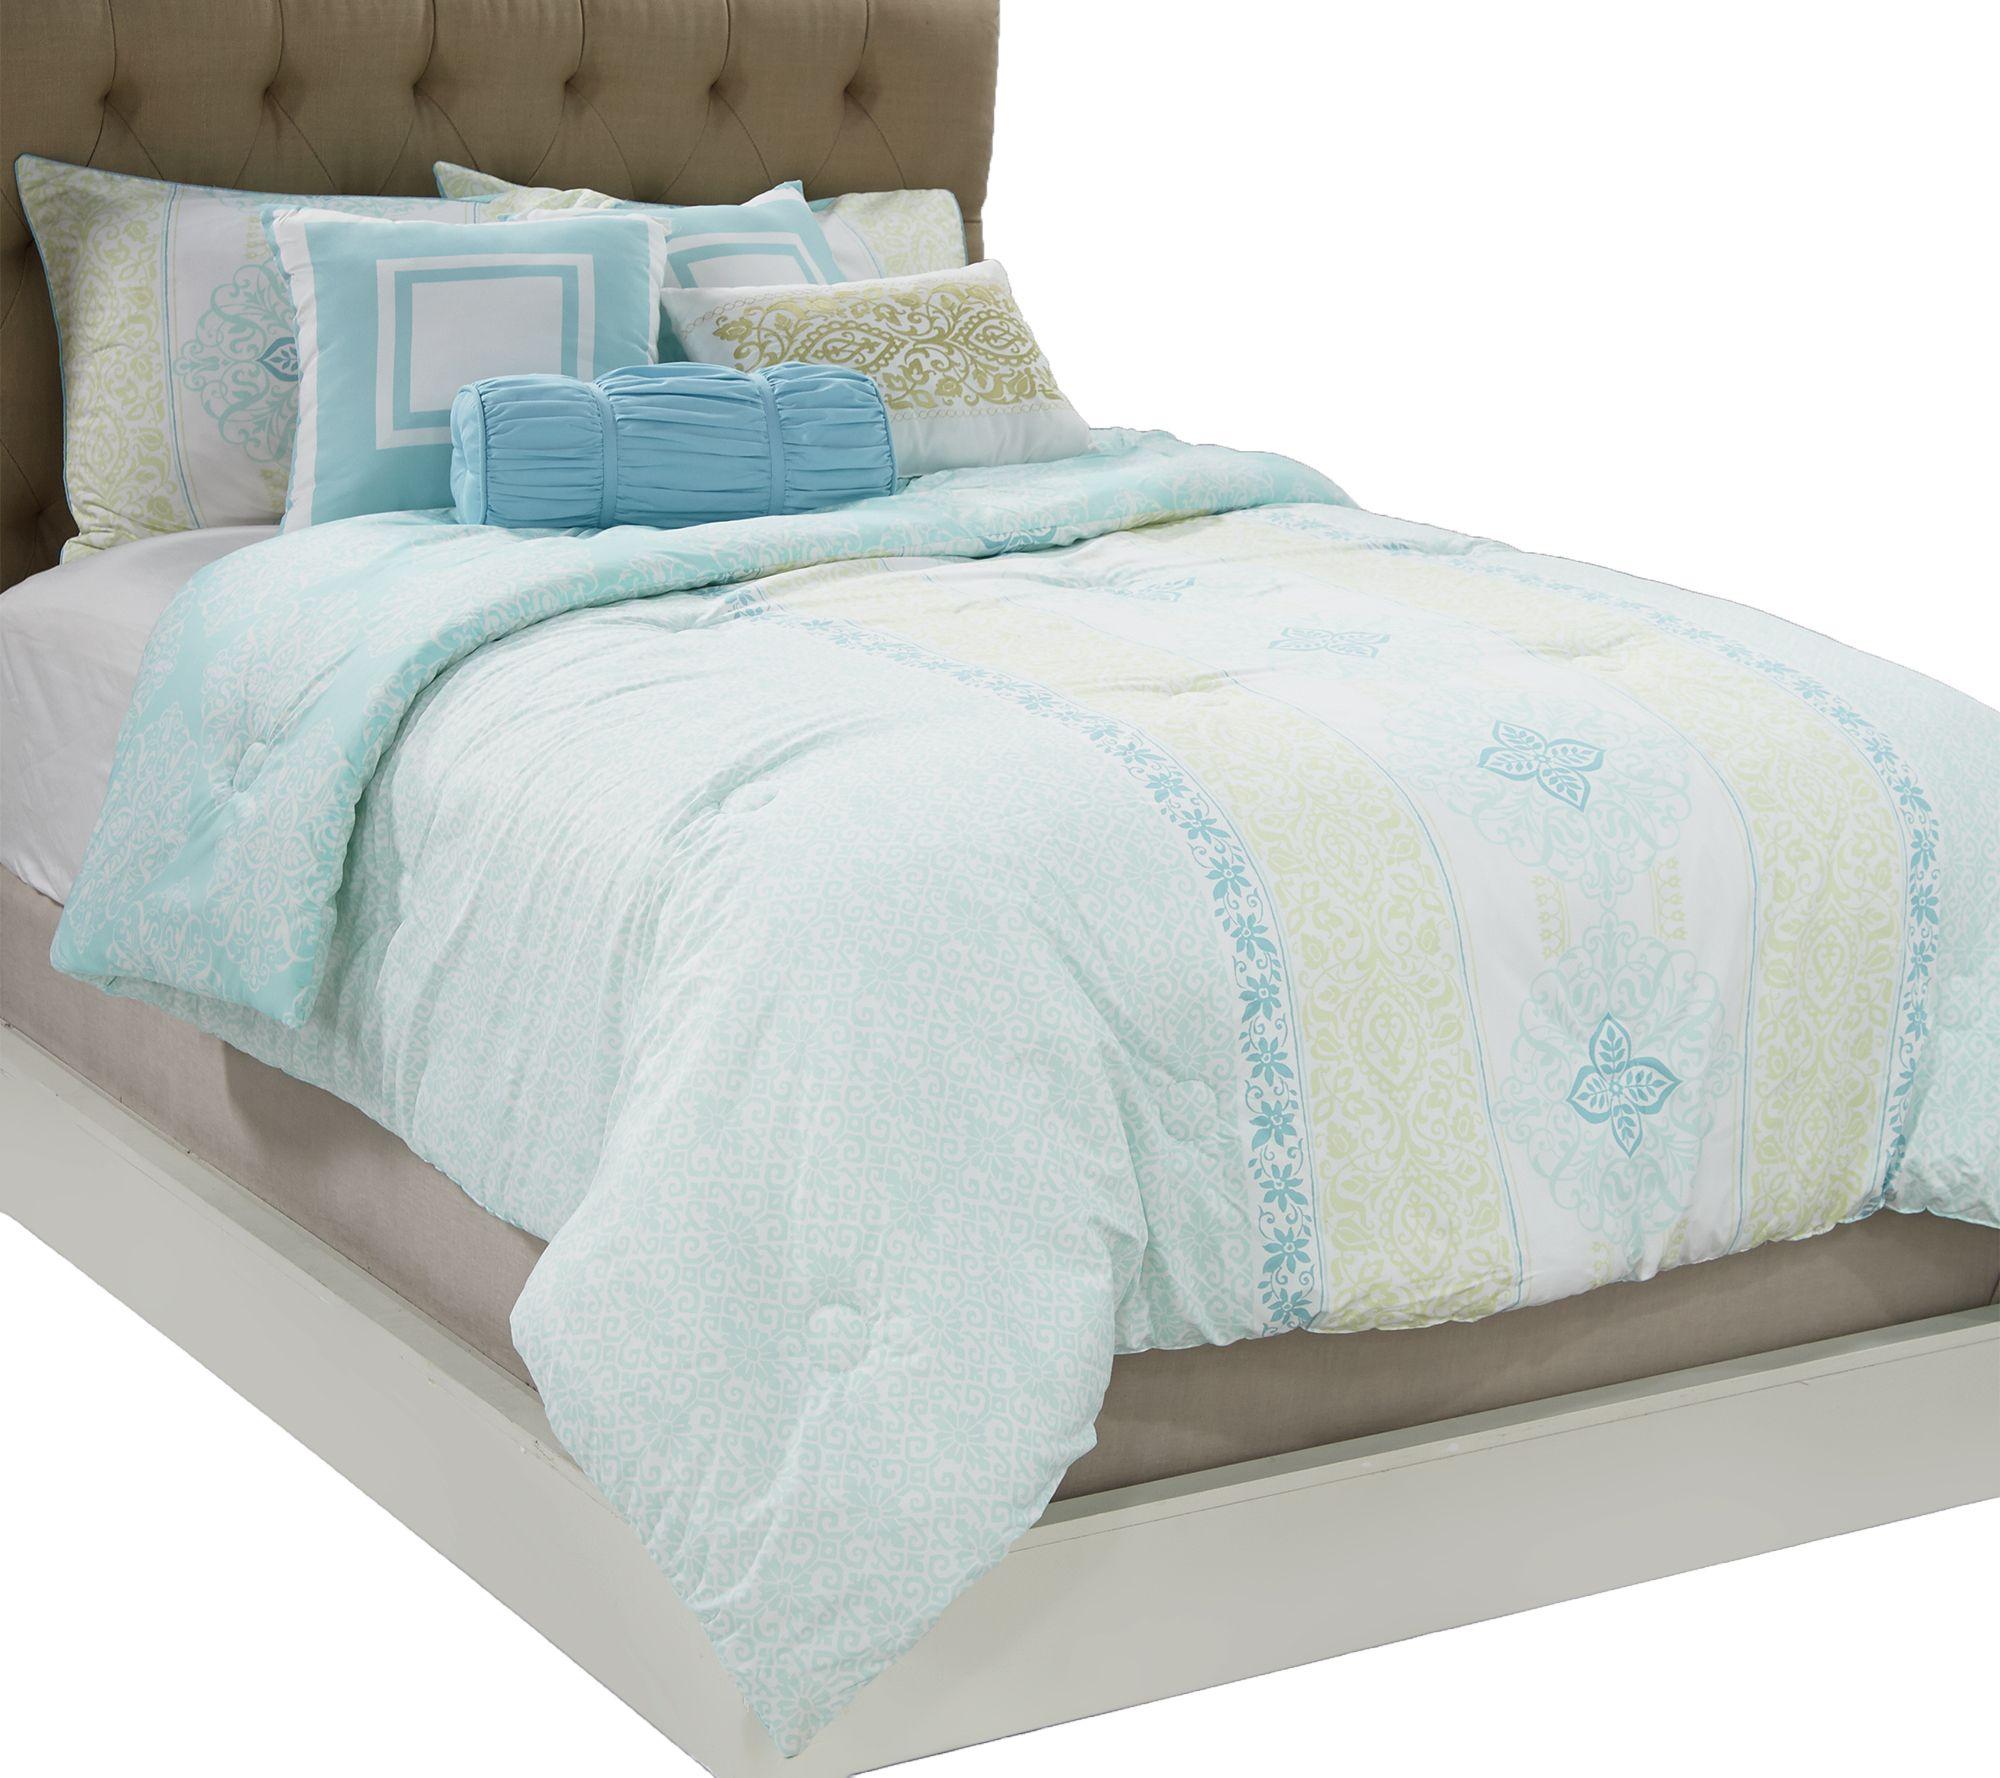 Home Reflections KG 7  Piece Medallion Comforter Set   Page 1 U2014 QVC.com